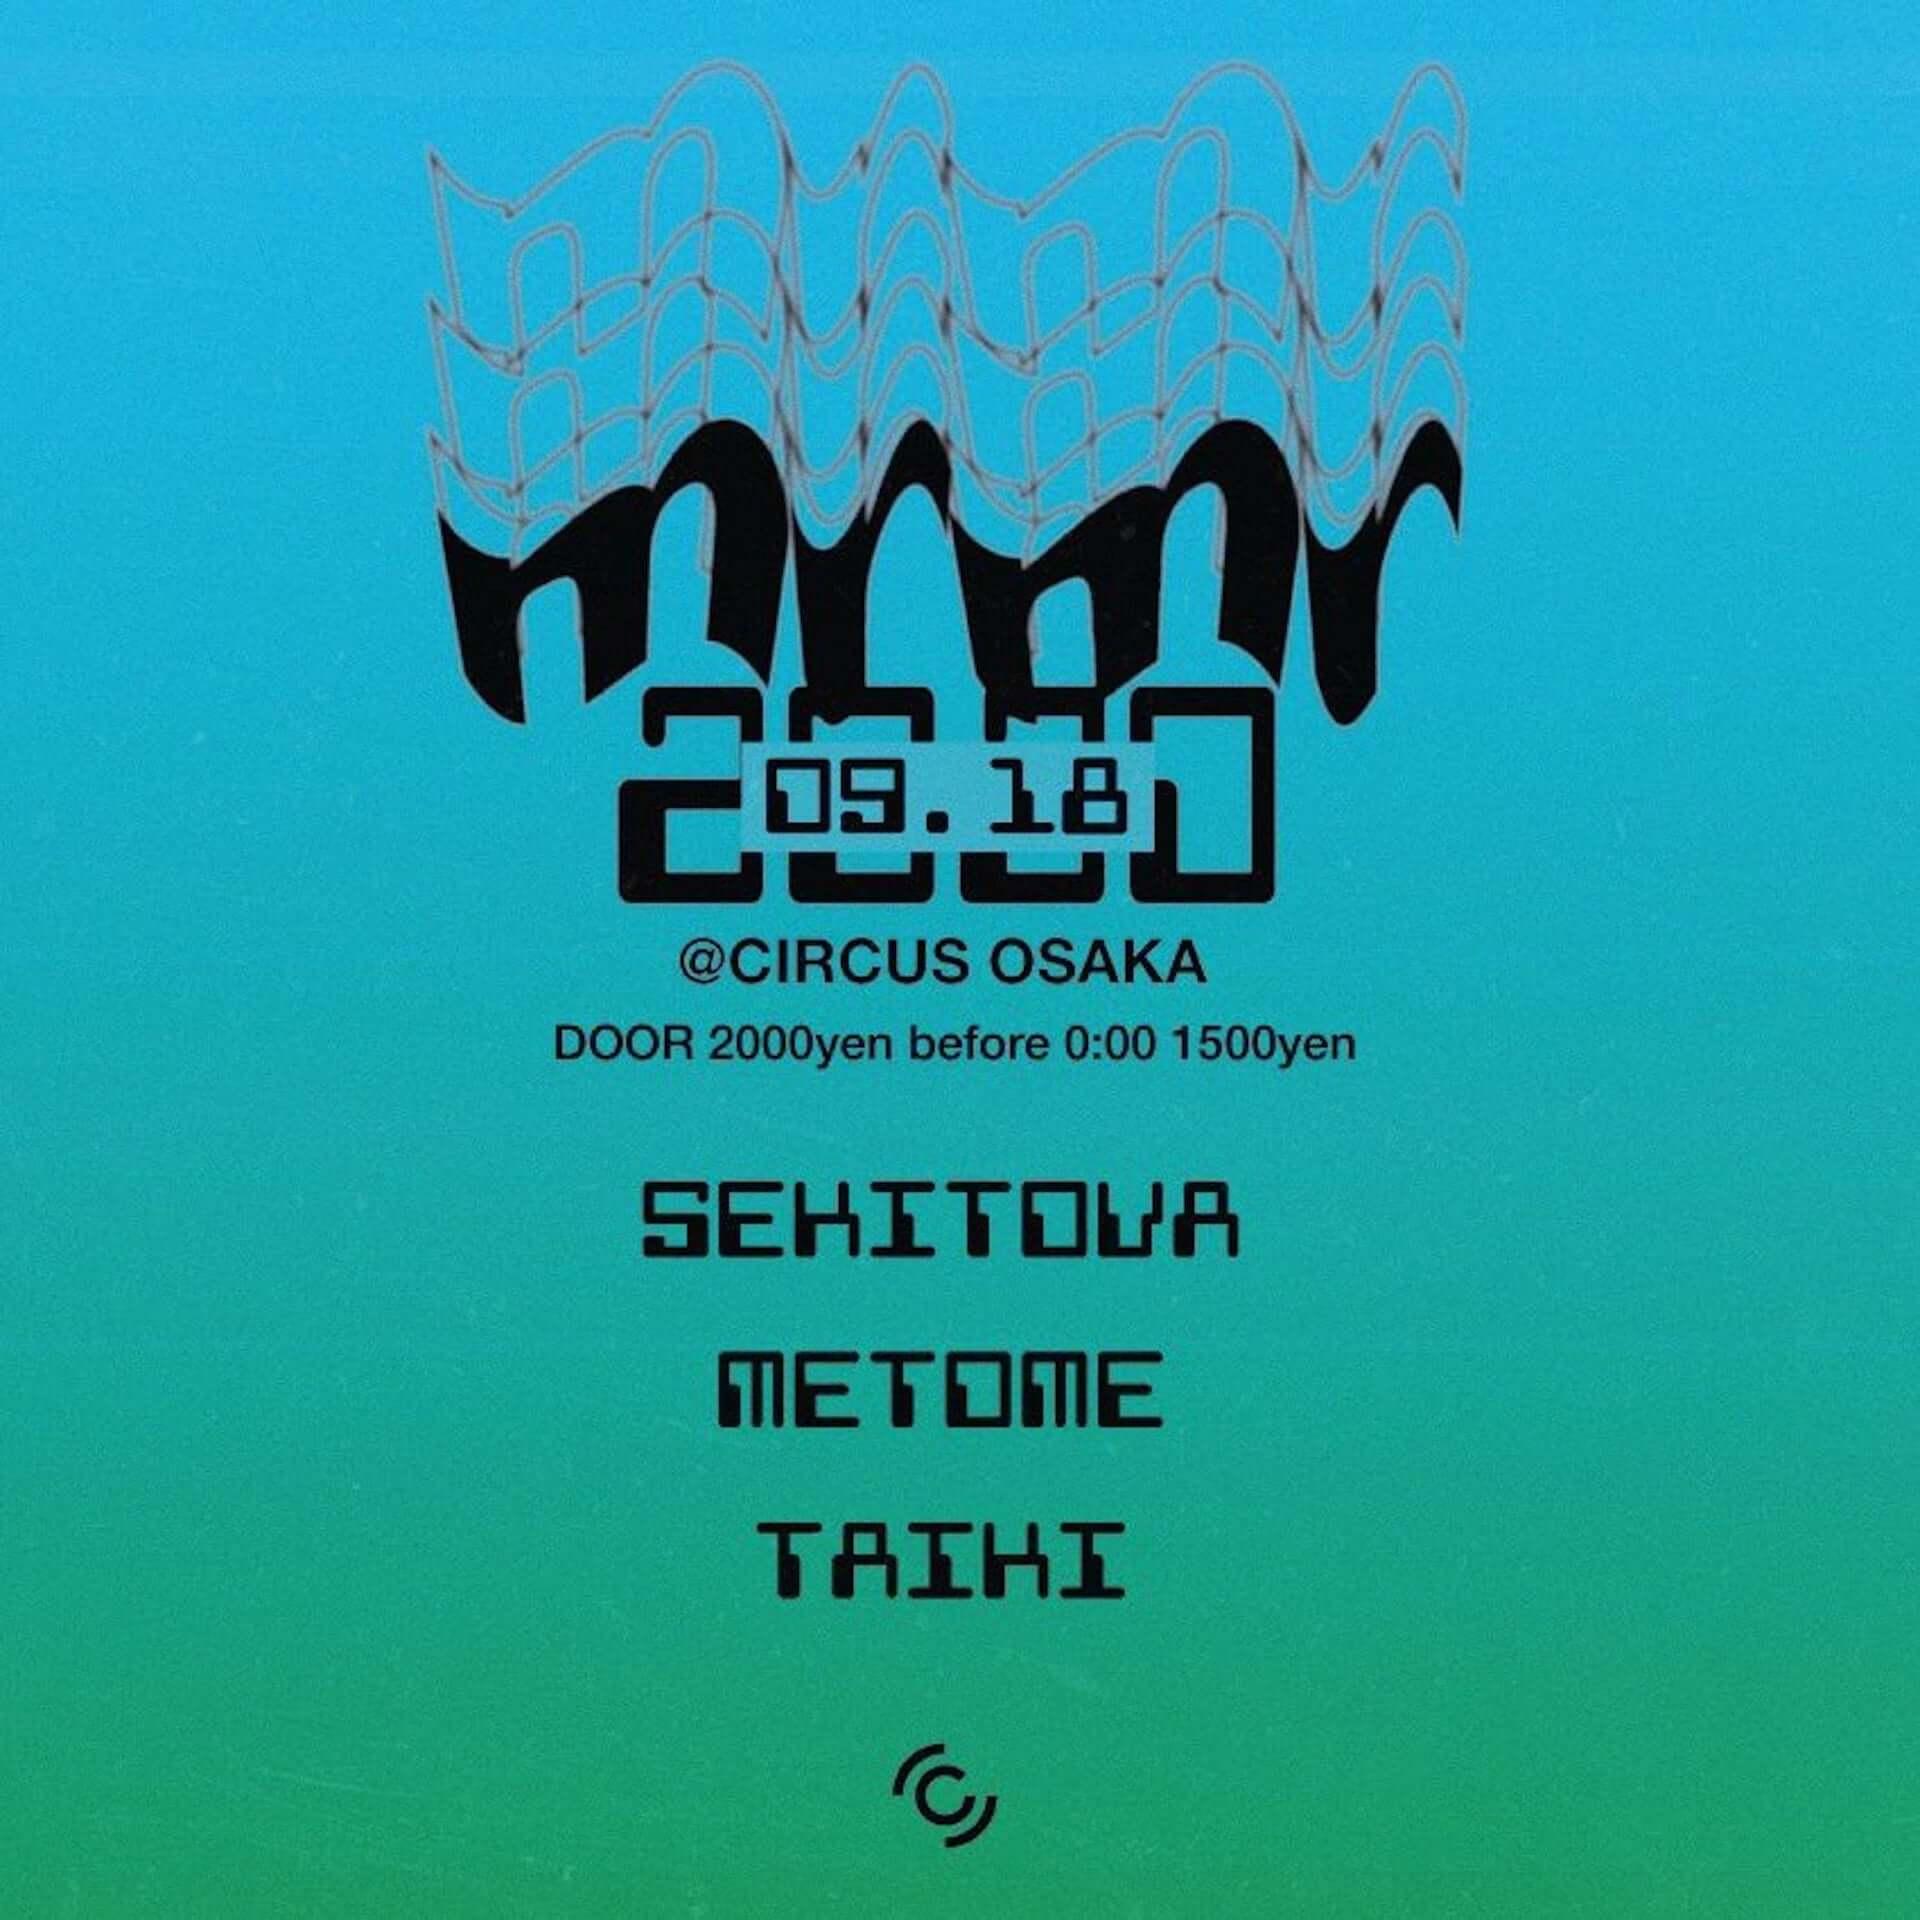 Sekitovaのレジデントパーティー<mrmr>にokadada、Metomeらが出演!CIRCUS TOKYO、CIRCUS OSAKAの公演詳細が解禁 music200908_sekitova-mrmr_3-1920x1920